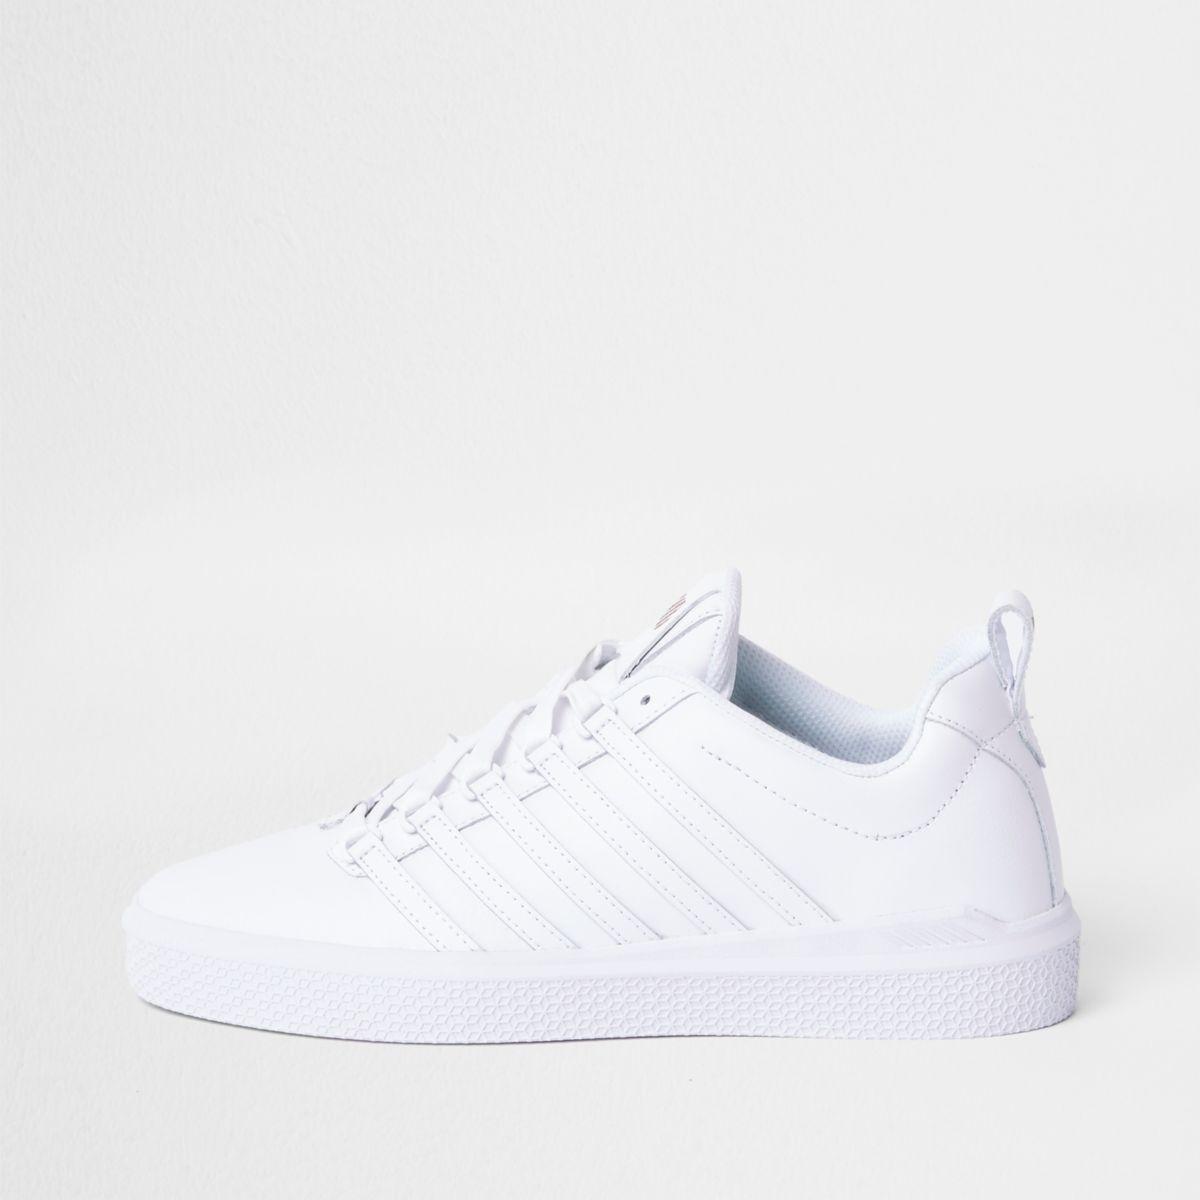 White K-Swiss premium leather sneakers